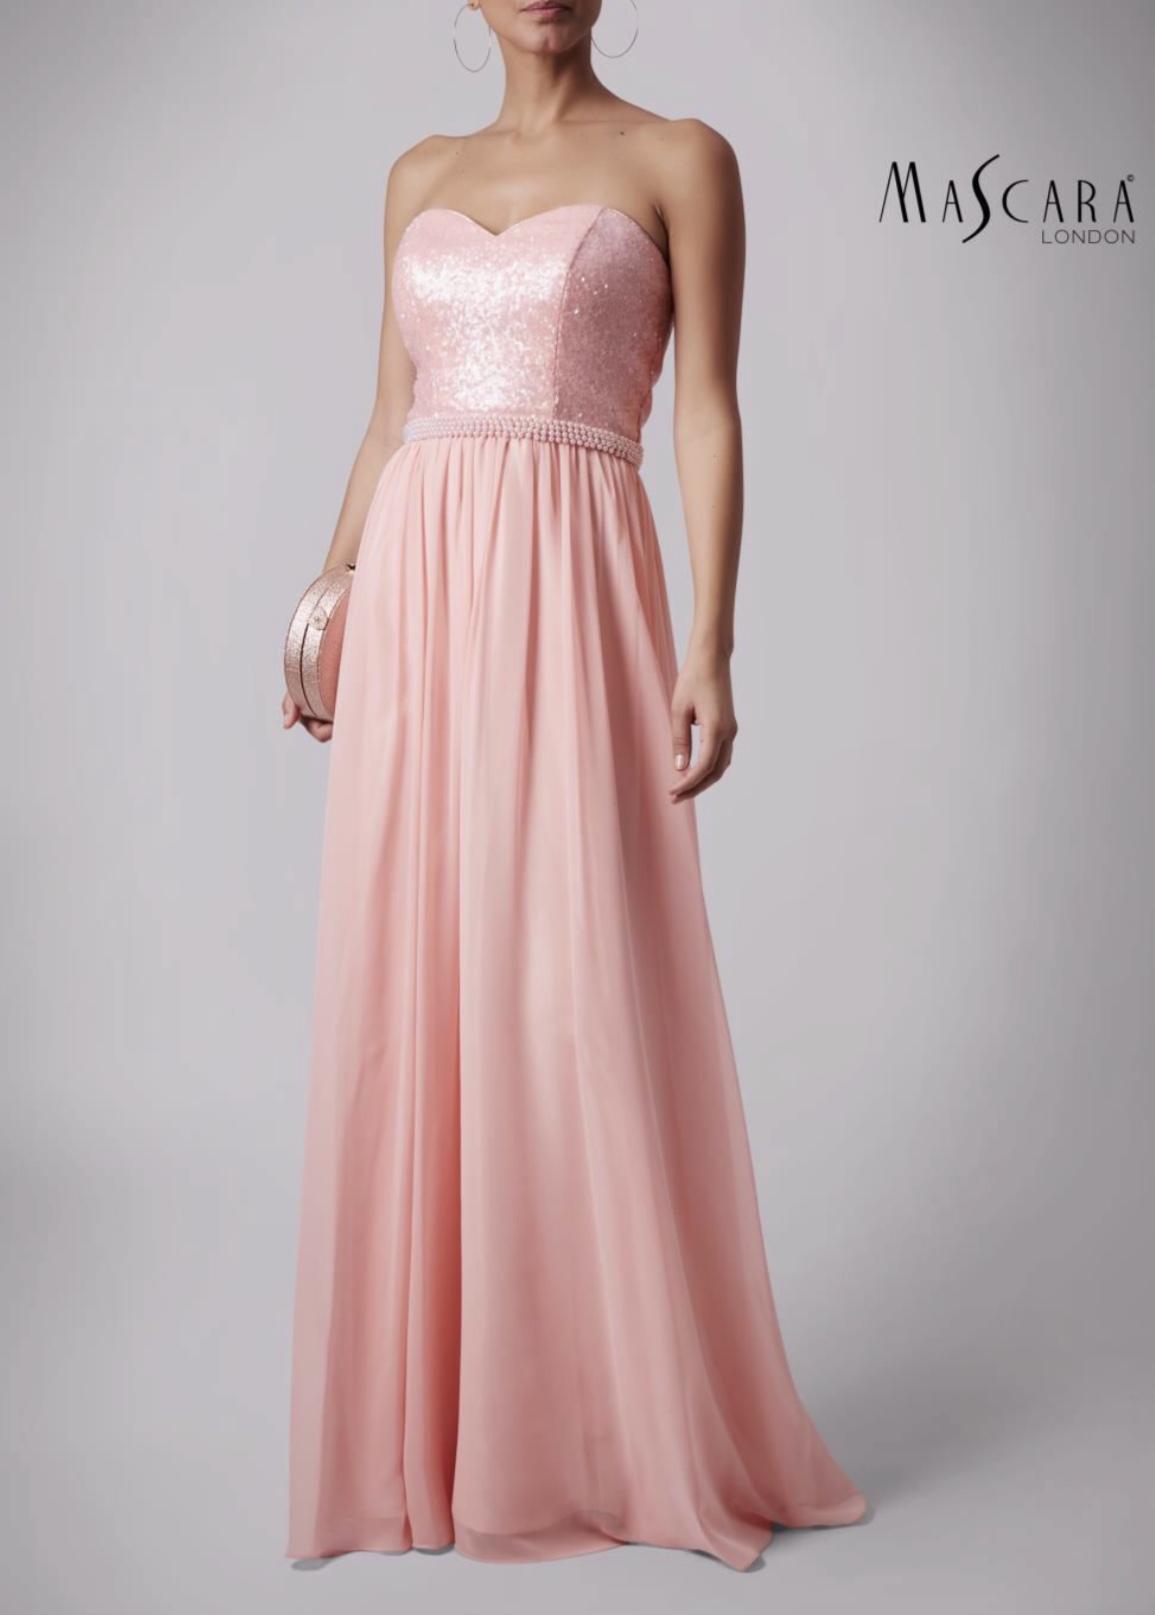 4c7ed83f13 Mascara Sequin Bodice Gown Blush MC186006 - Ladida Boutique